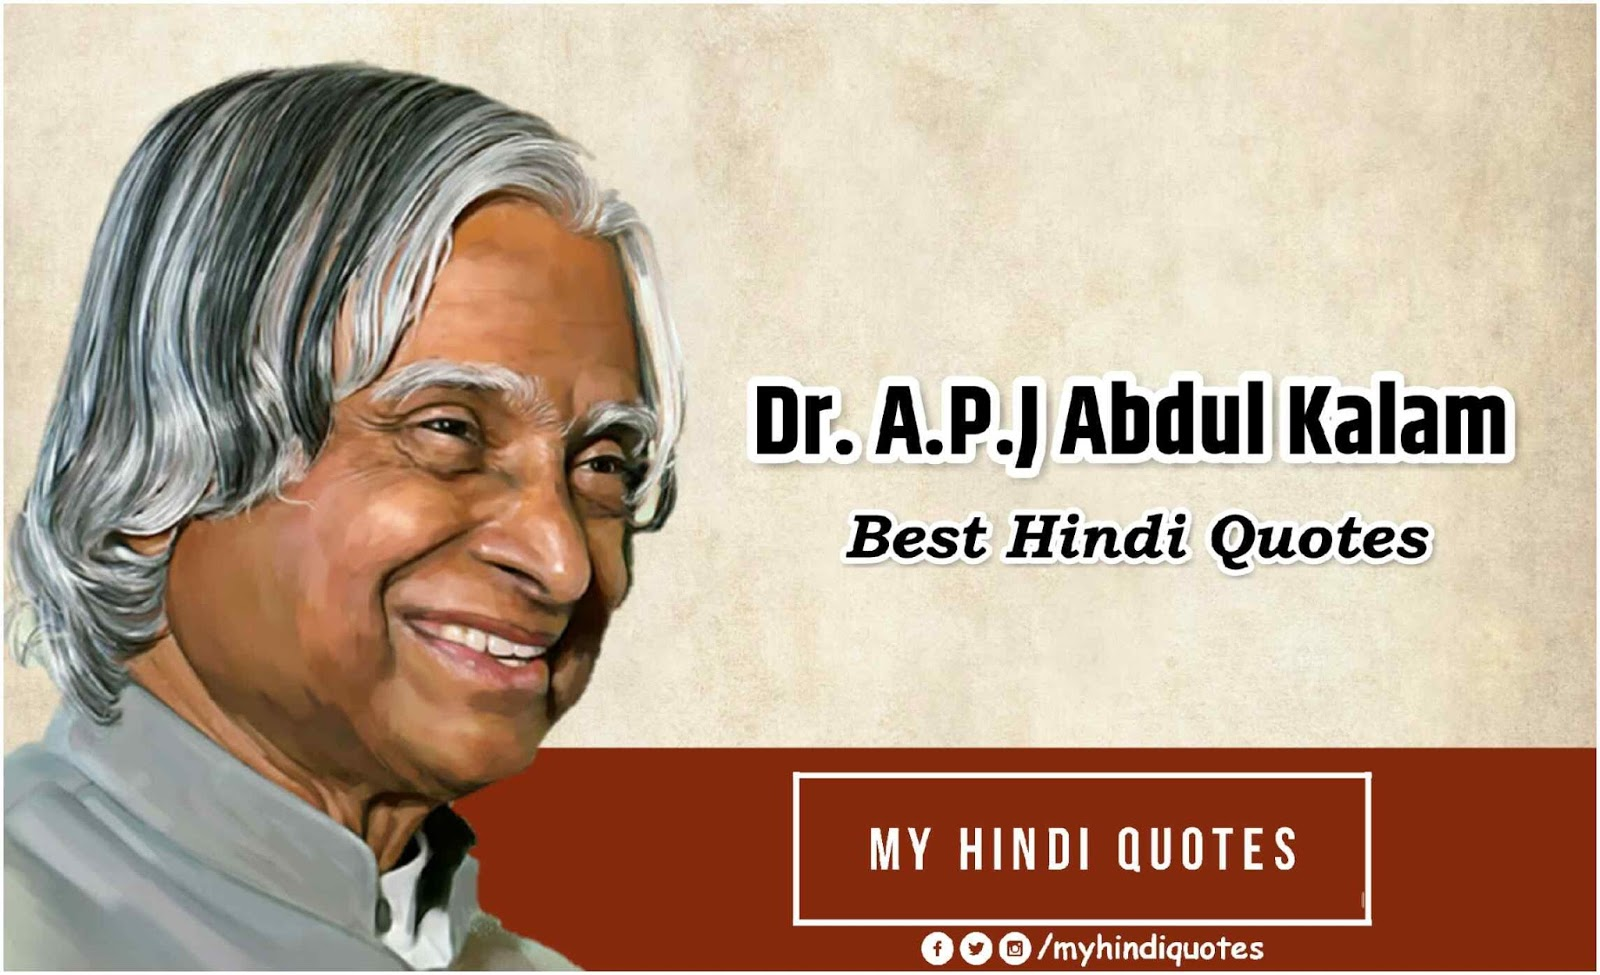 Dr. A.P.J. Abdul Kalam Best Hindi Quotes